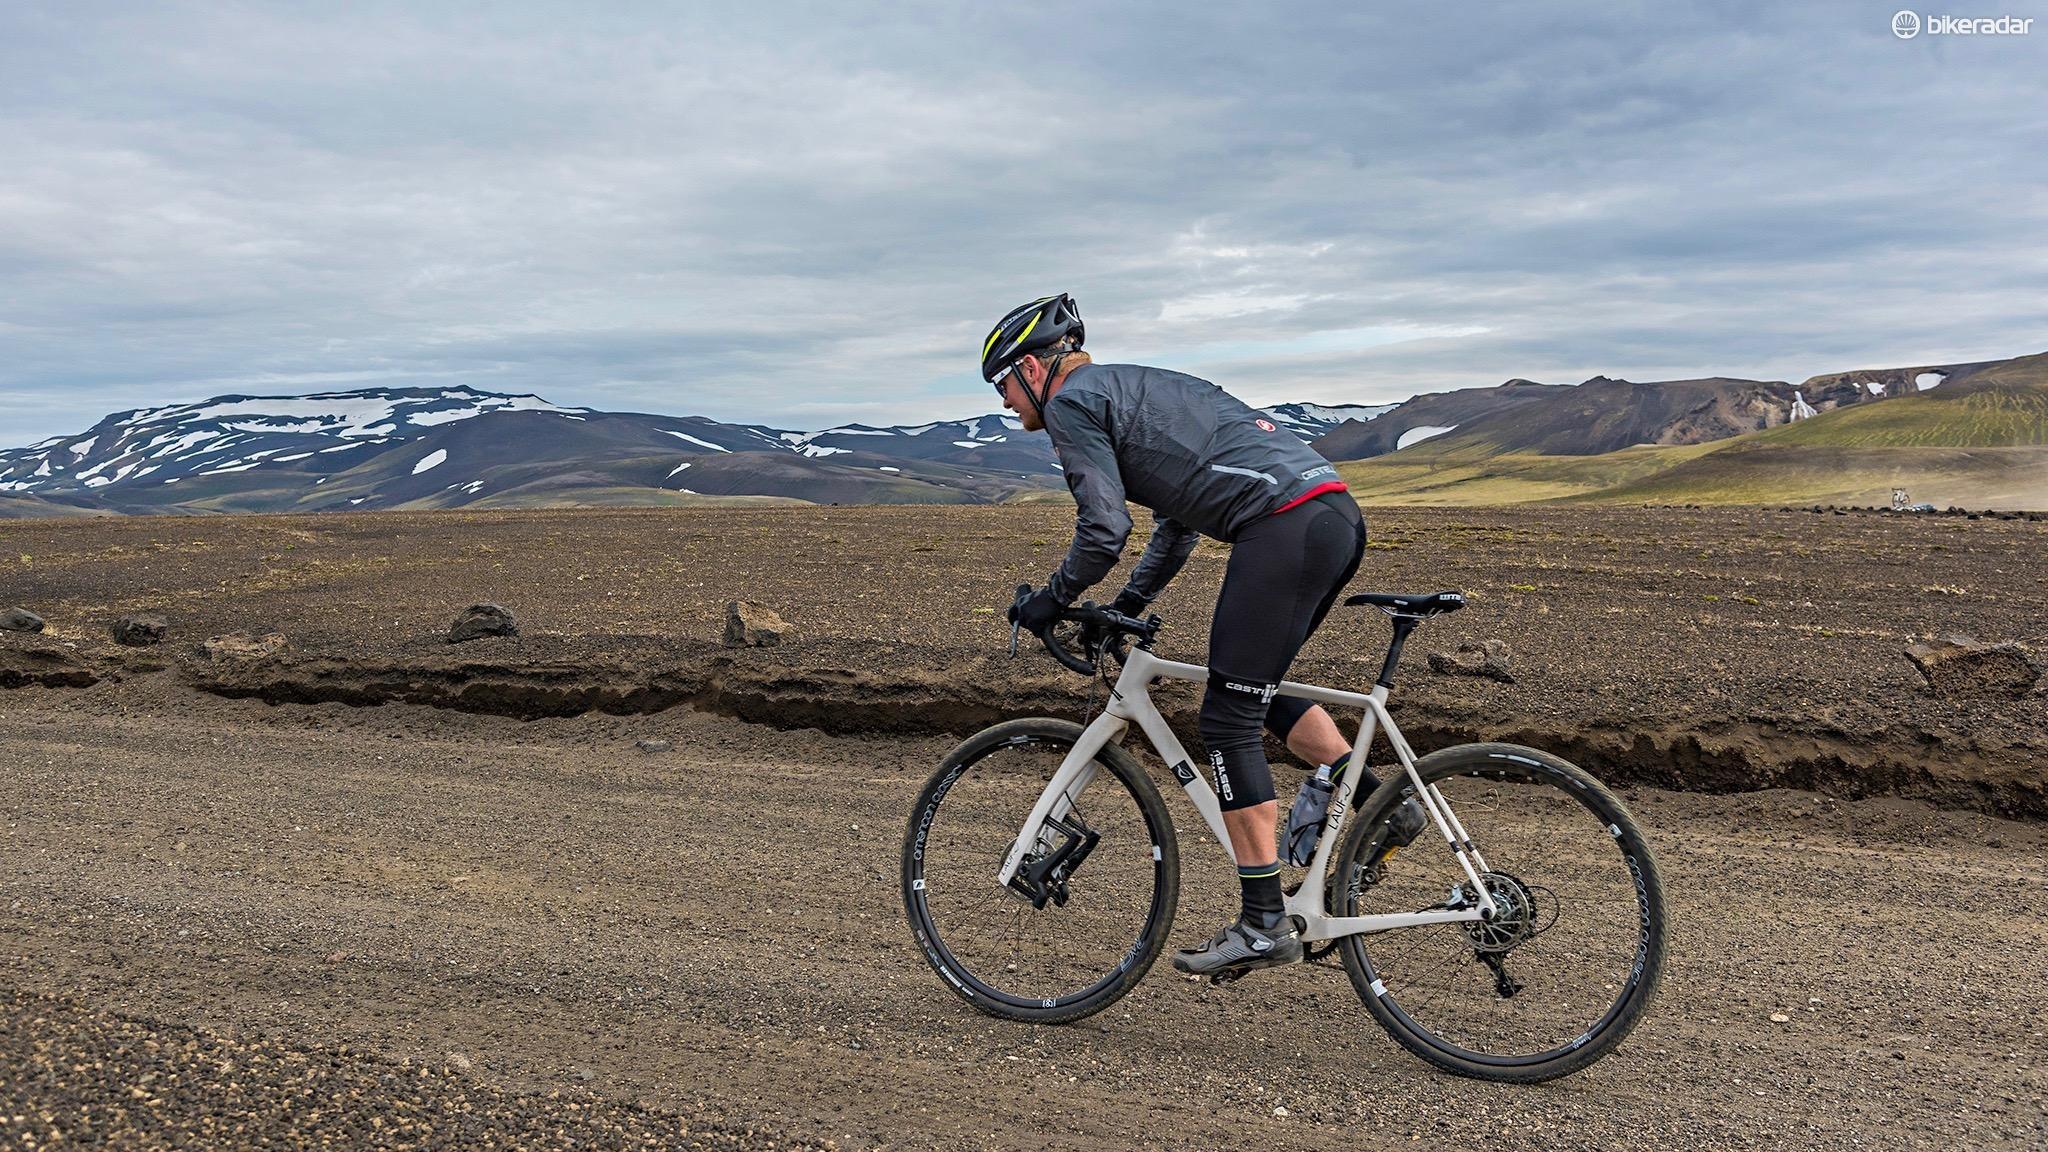 The True Grit is an excellent gravel race bike